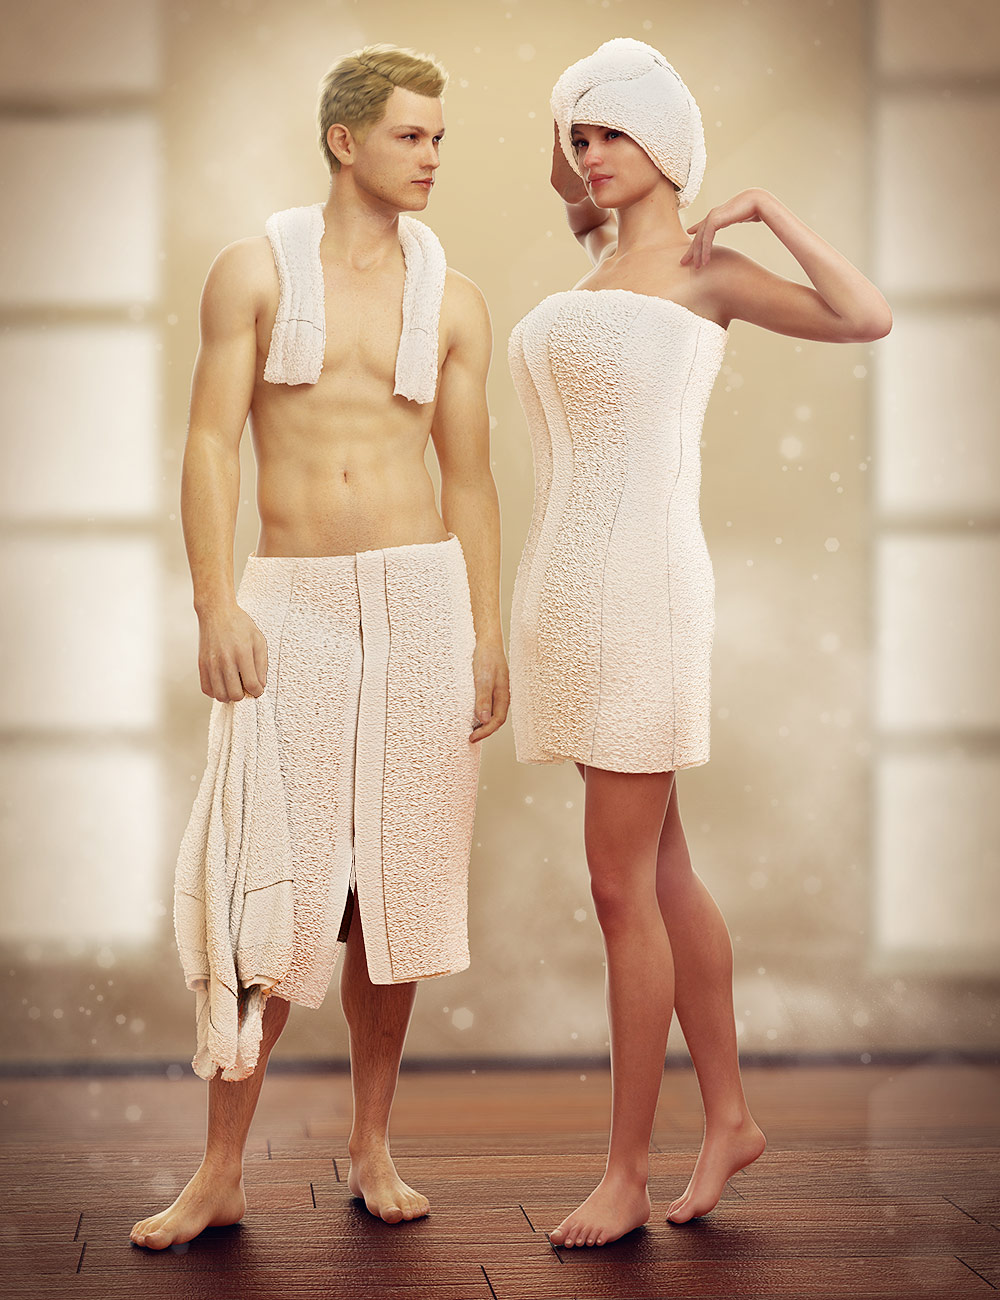 Towel Set for Genesis by: SickleyieldMarieah, 3D Models by Daz 3D